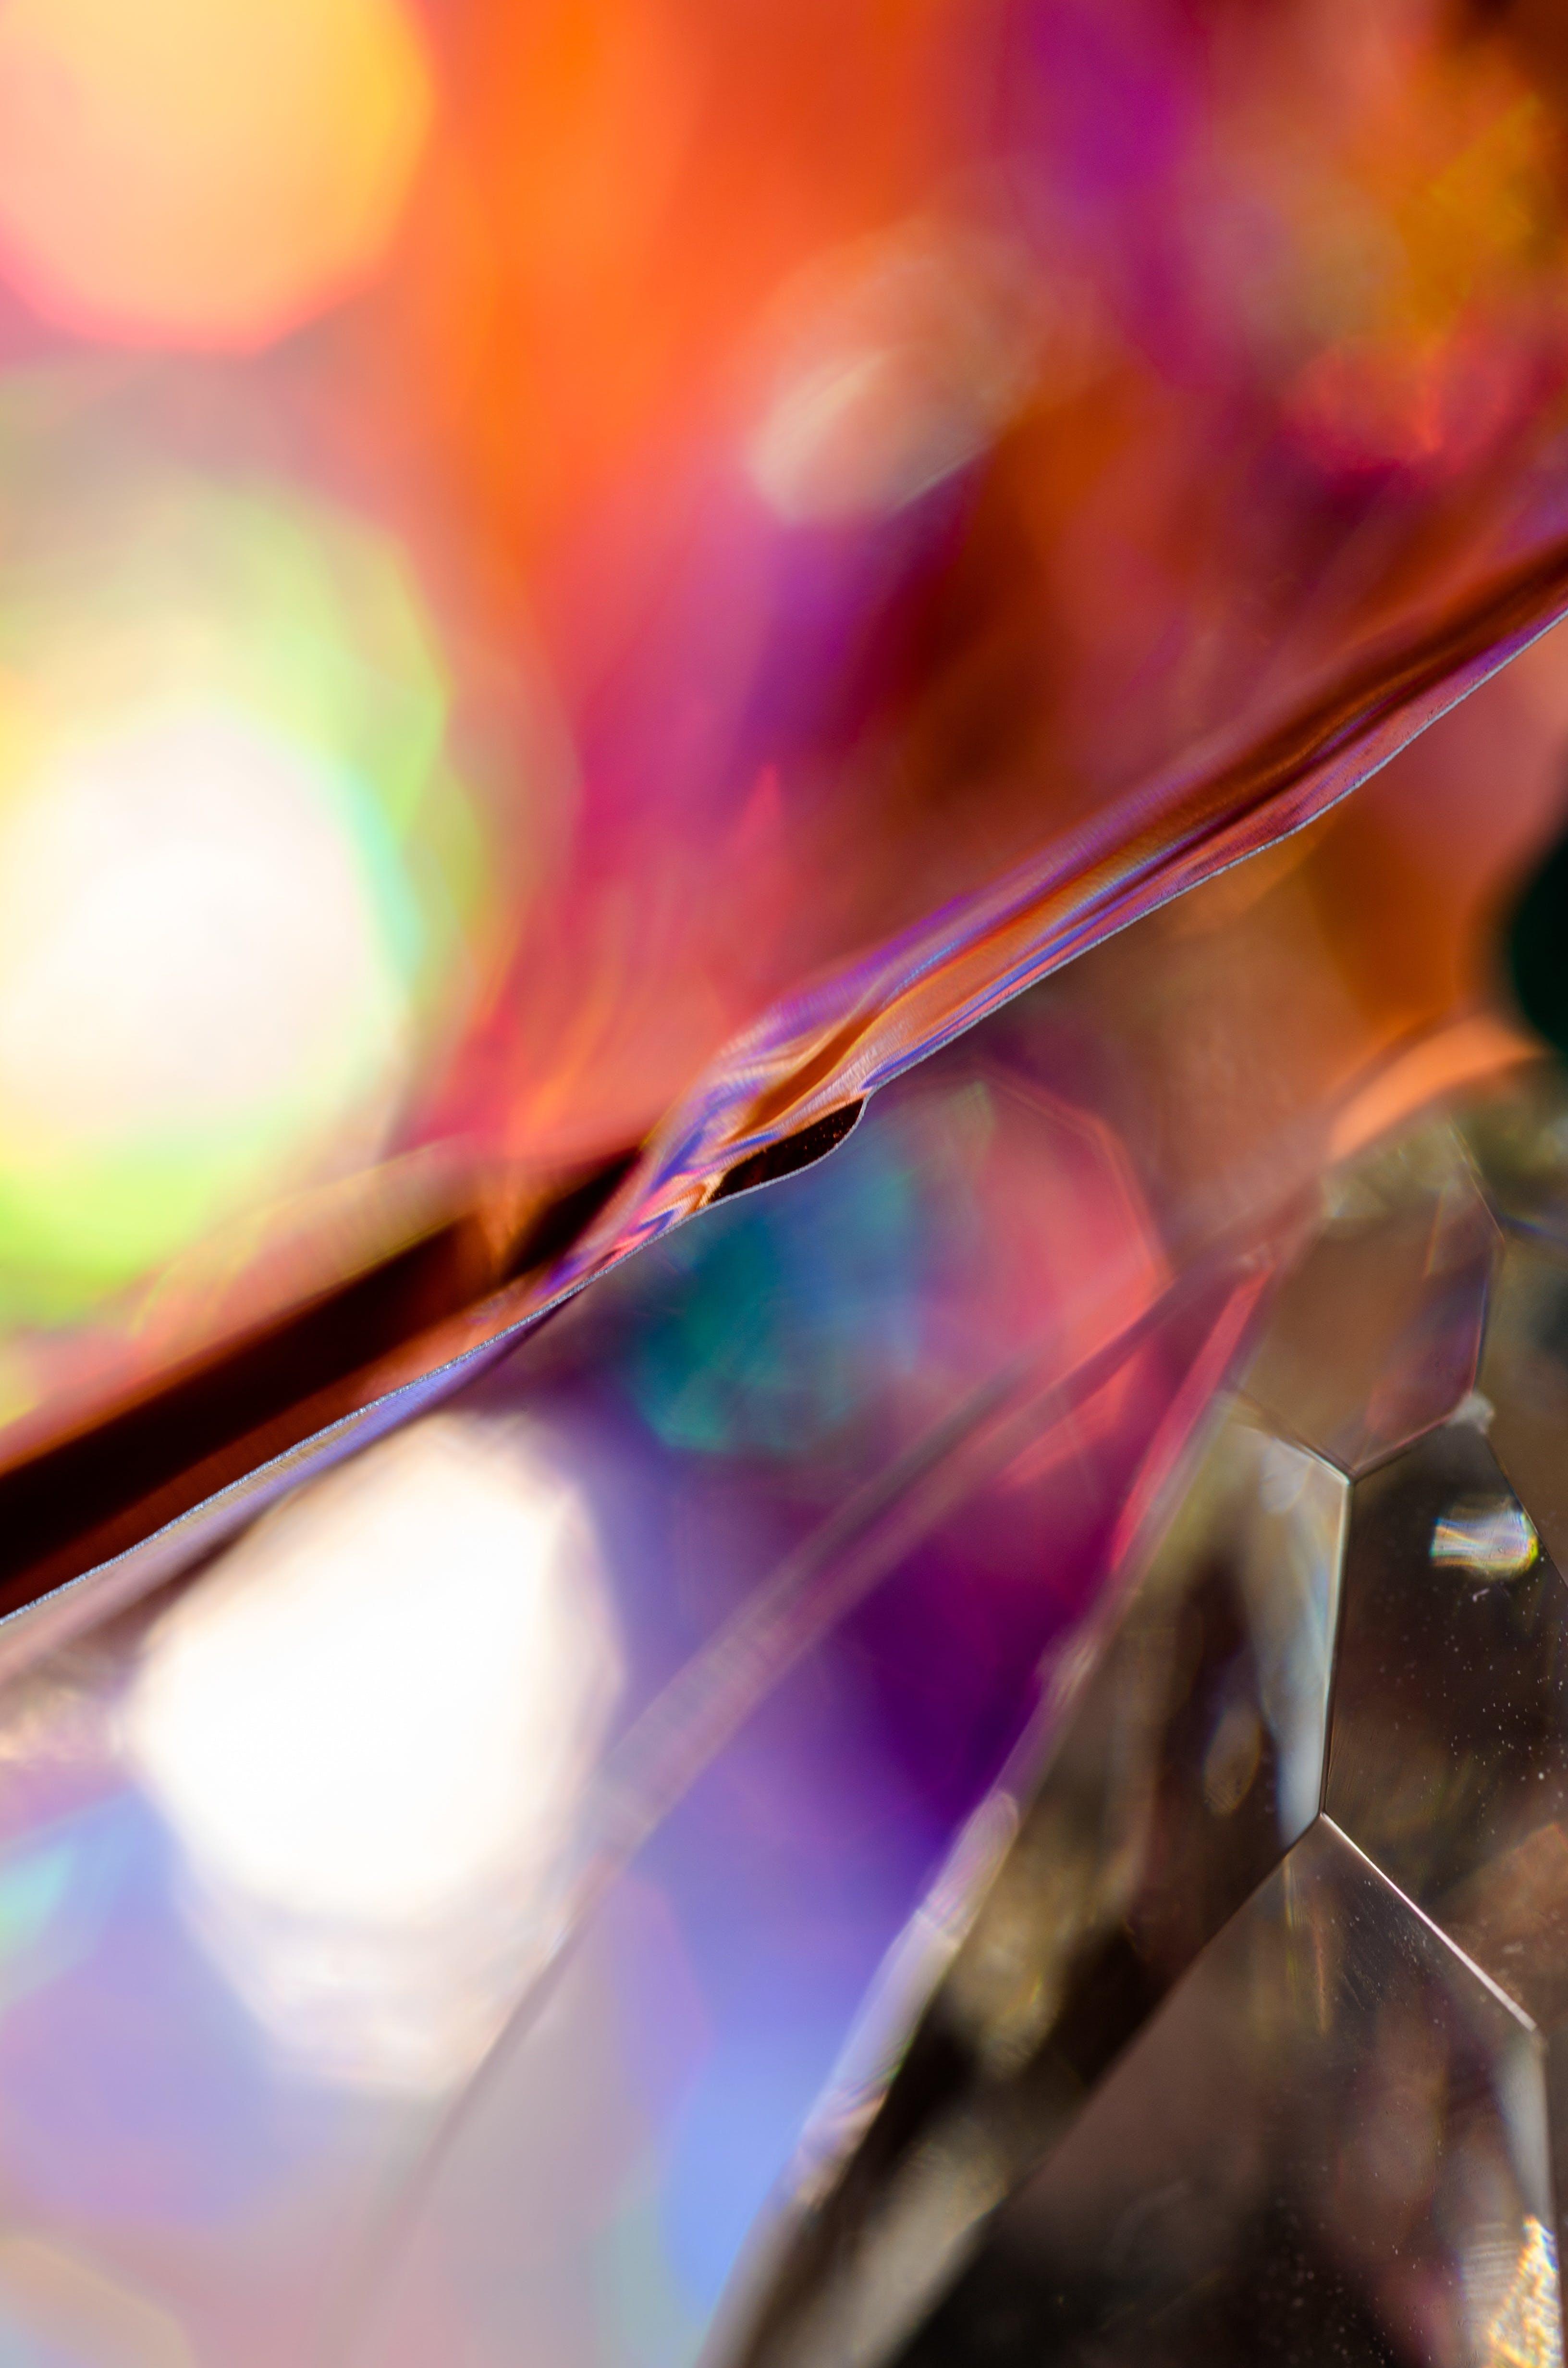 Closeup of Refracted Light